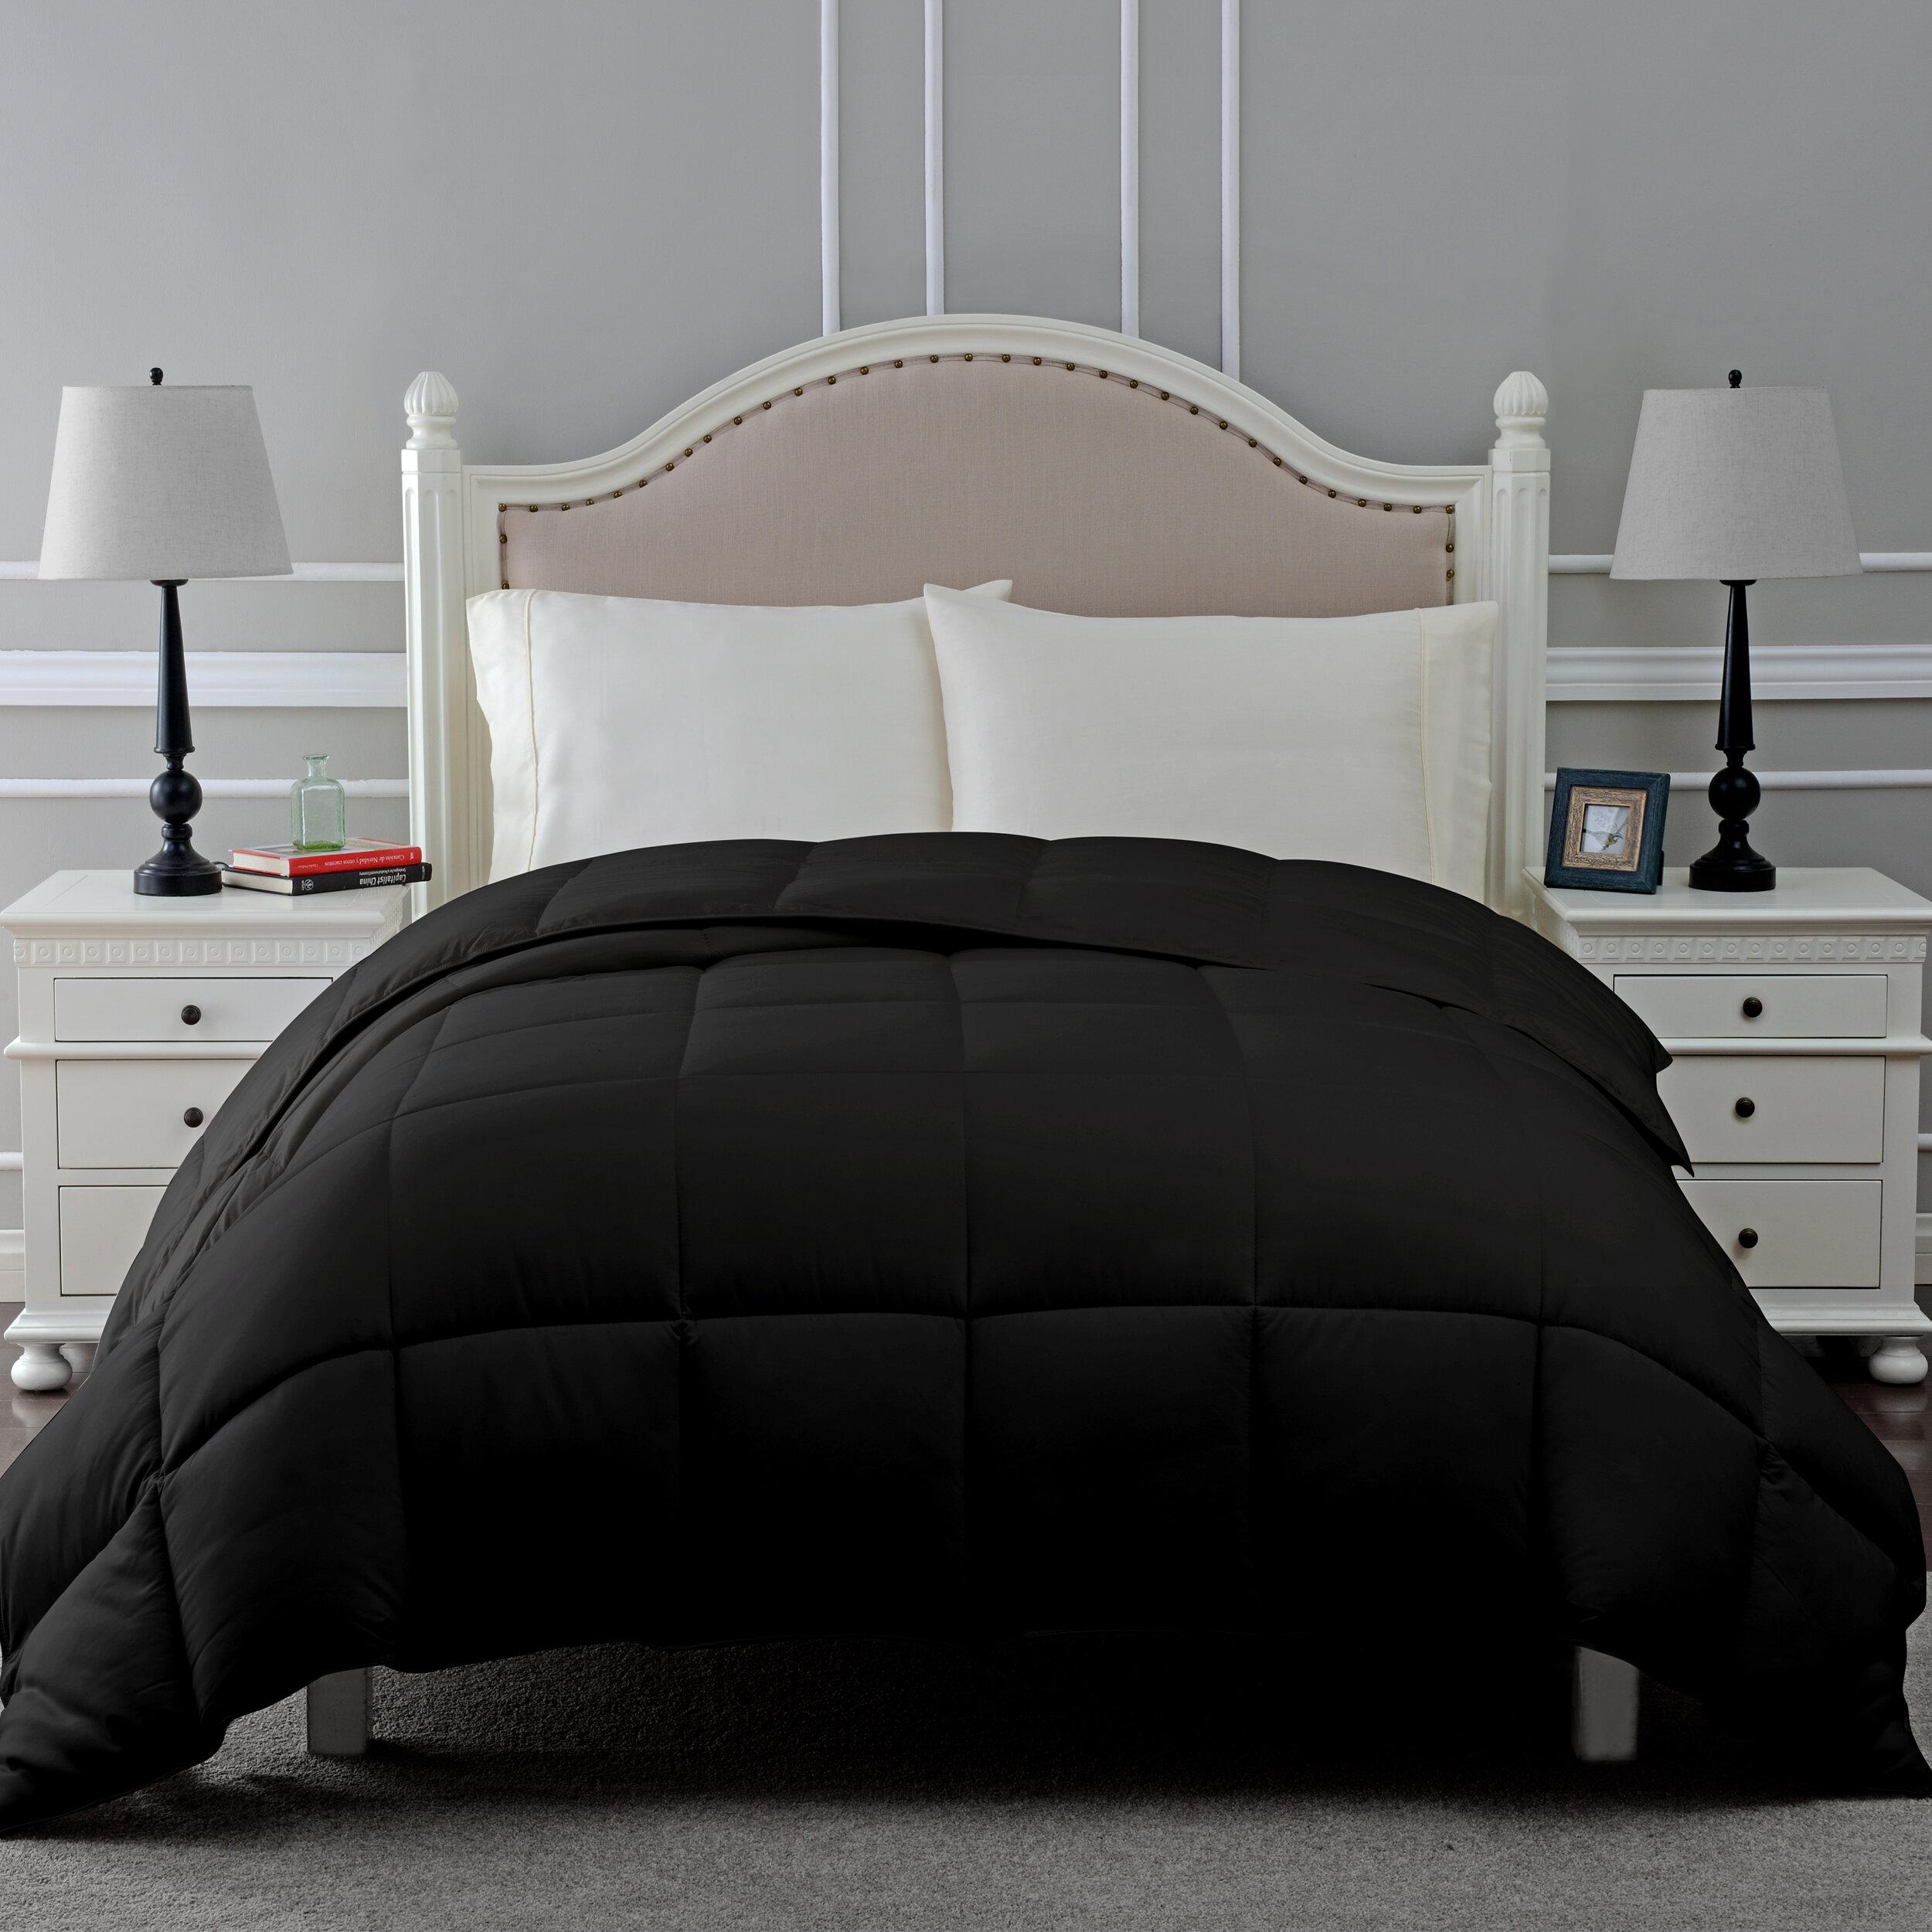 Black Down Comforters Duvet Inserts You Ll Love In 2021 Wayfair